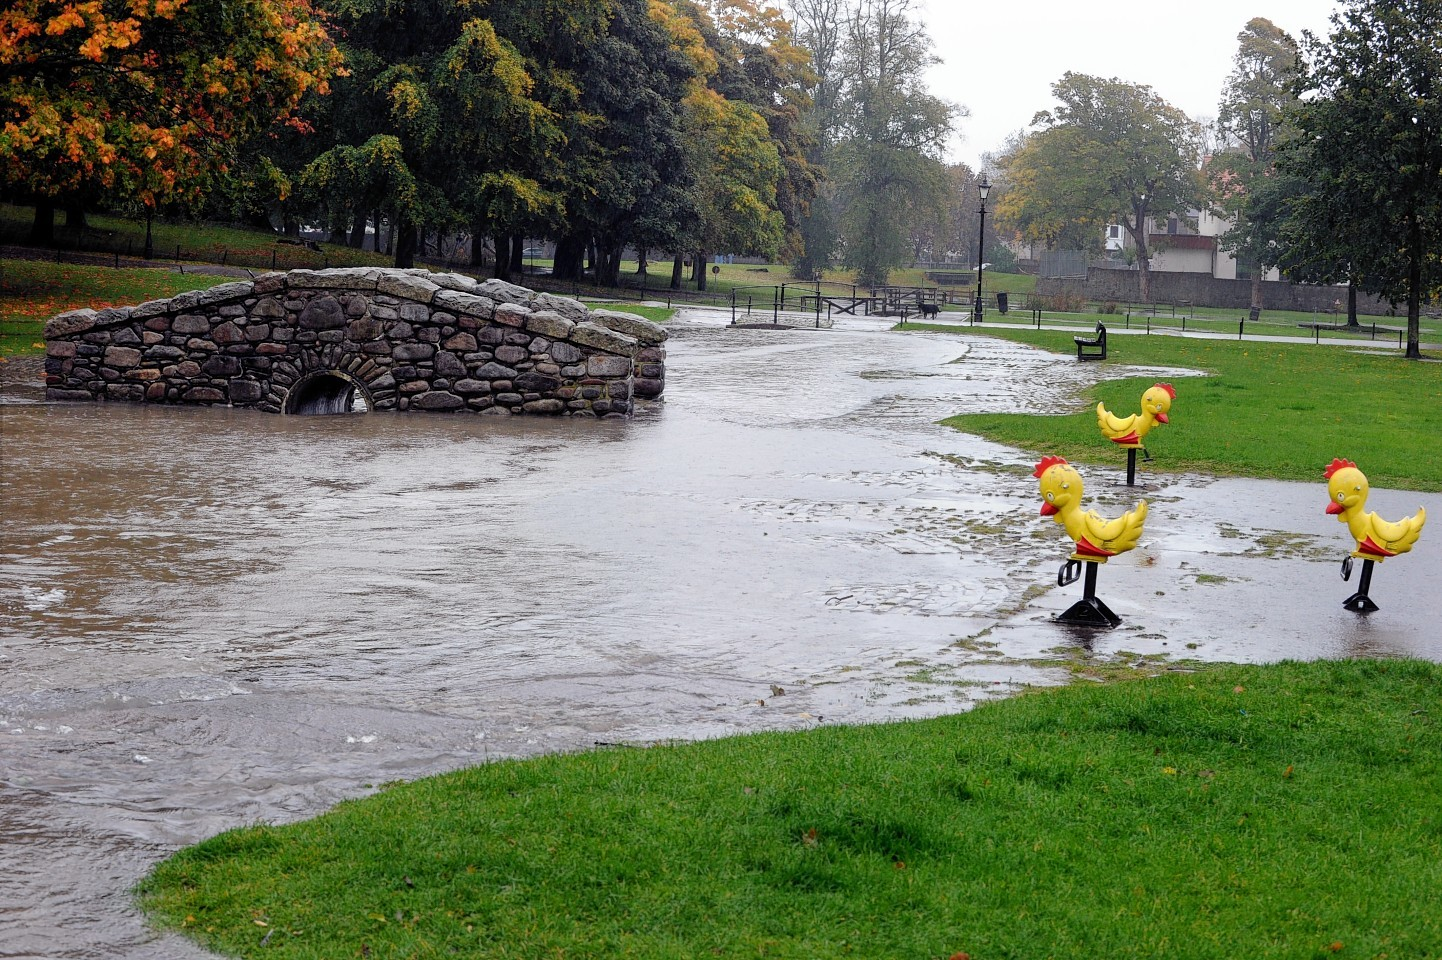 The ducks of Westburn Park